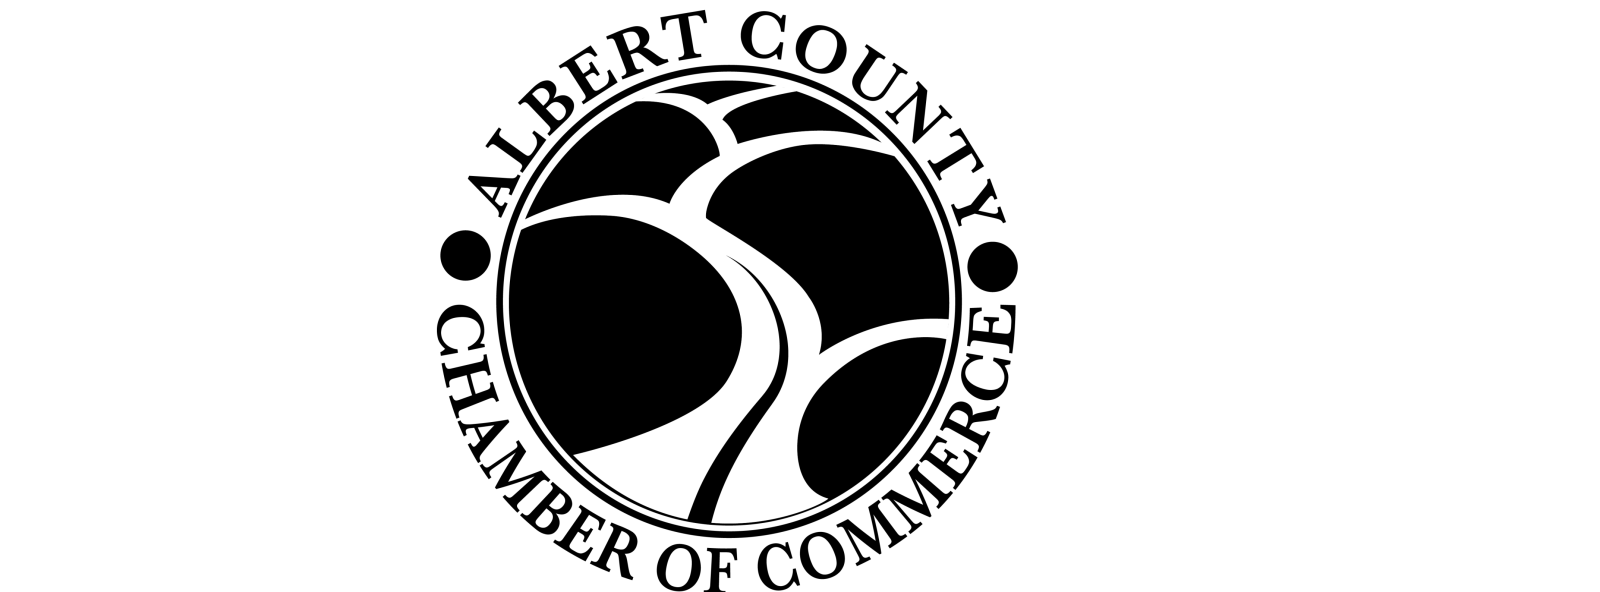 Albert County Chamber of Commerce